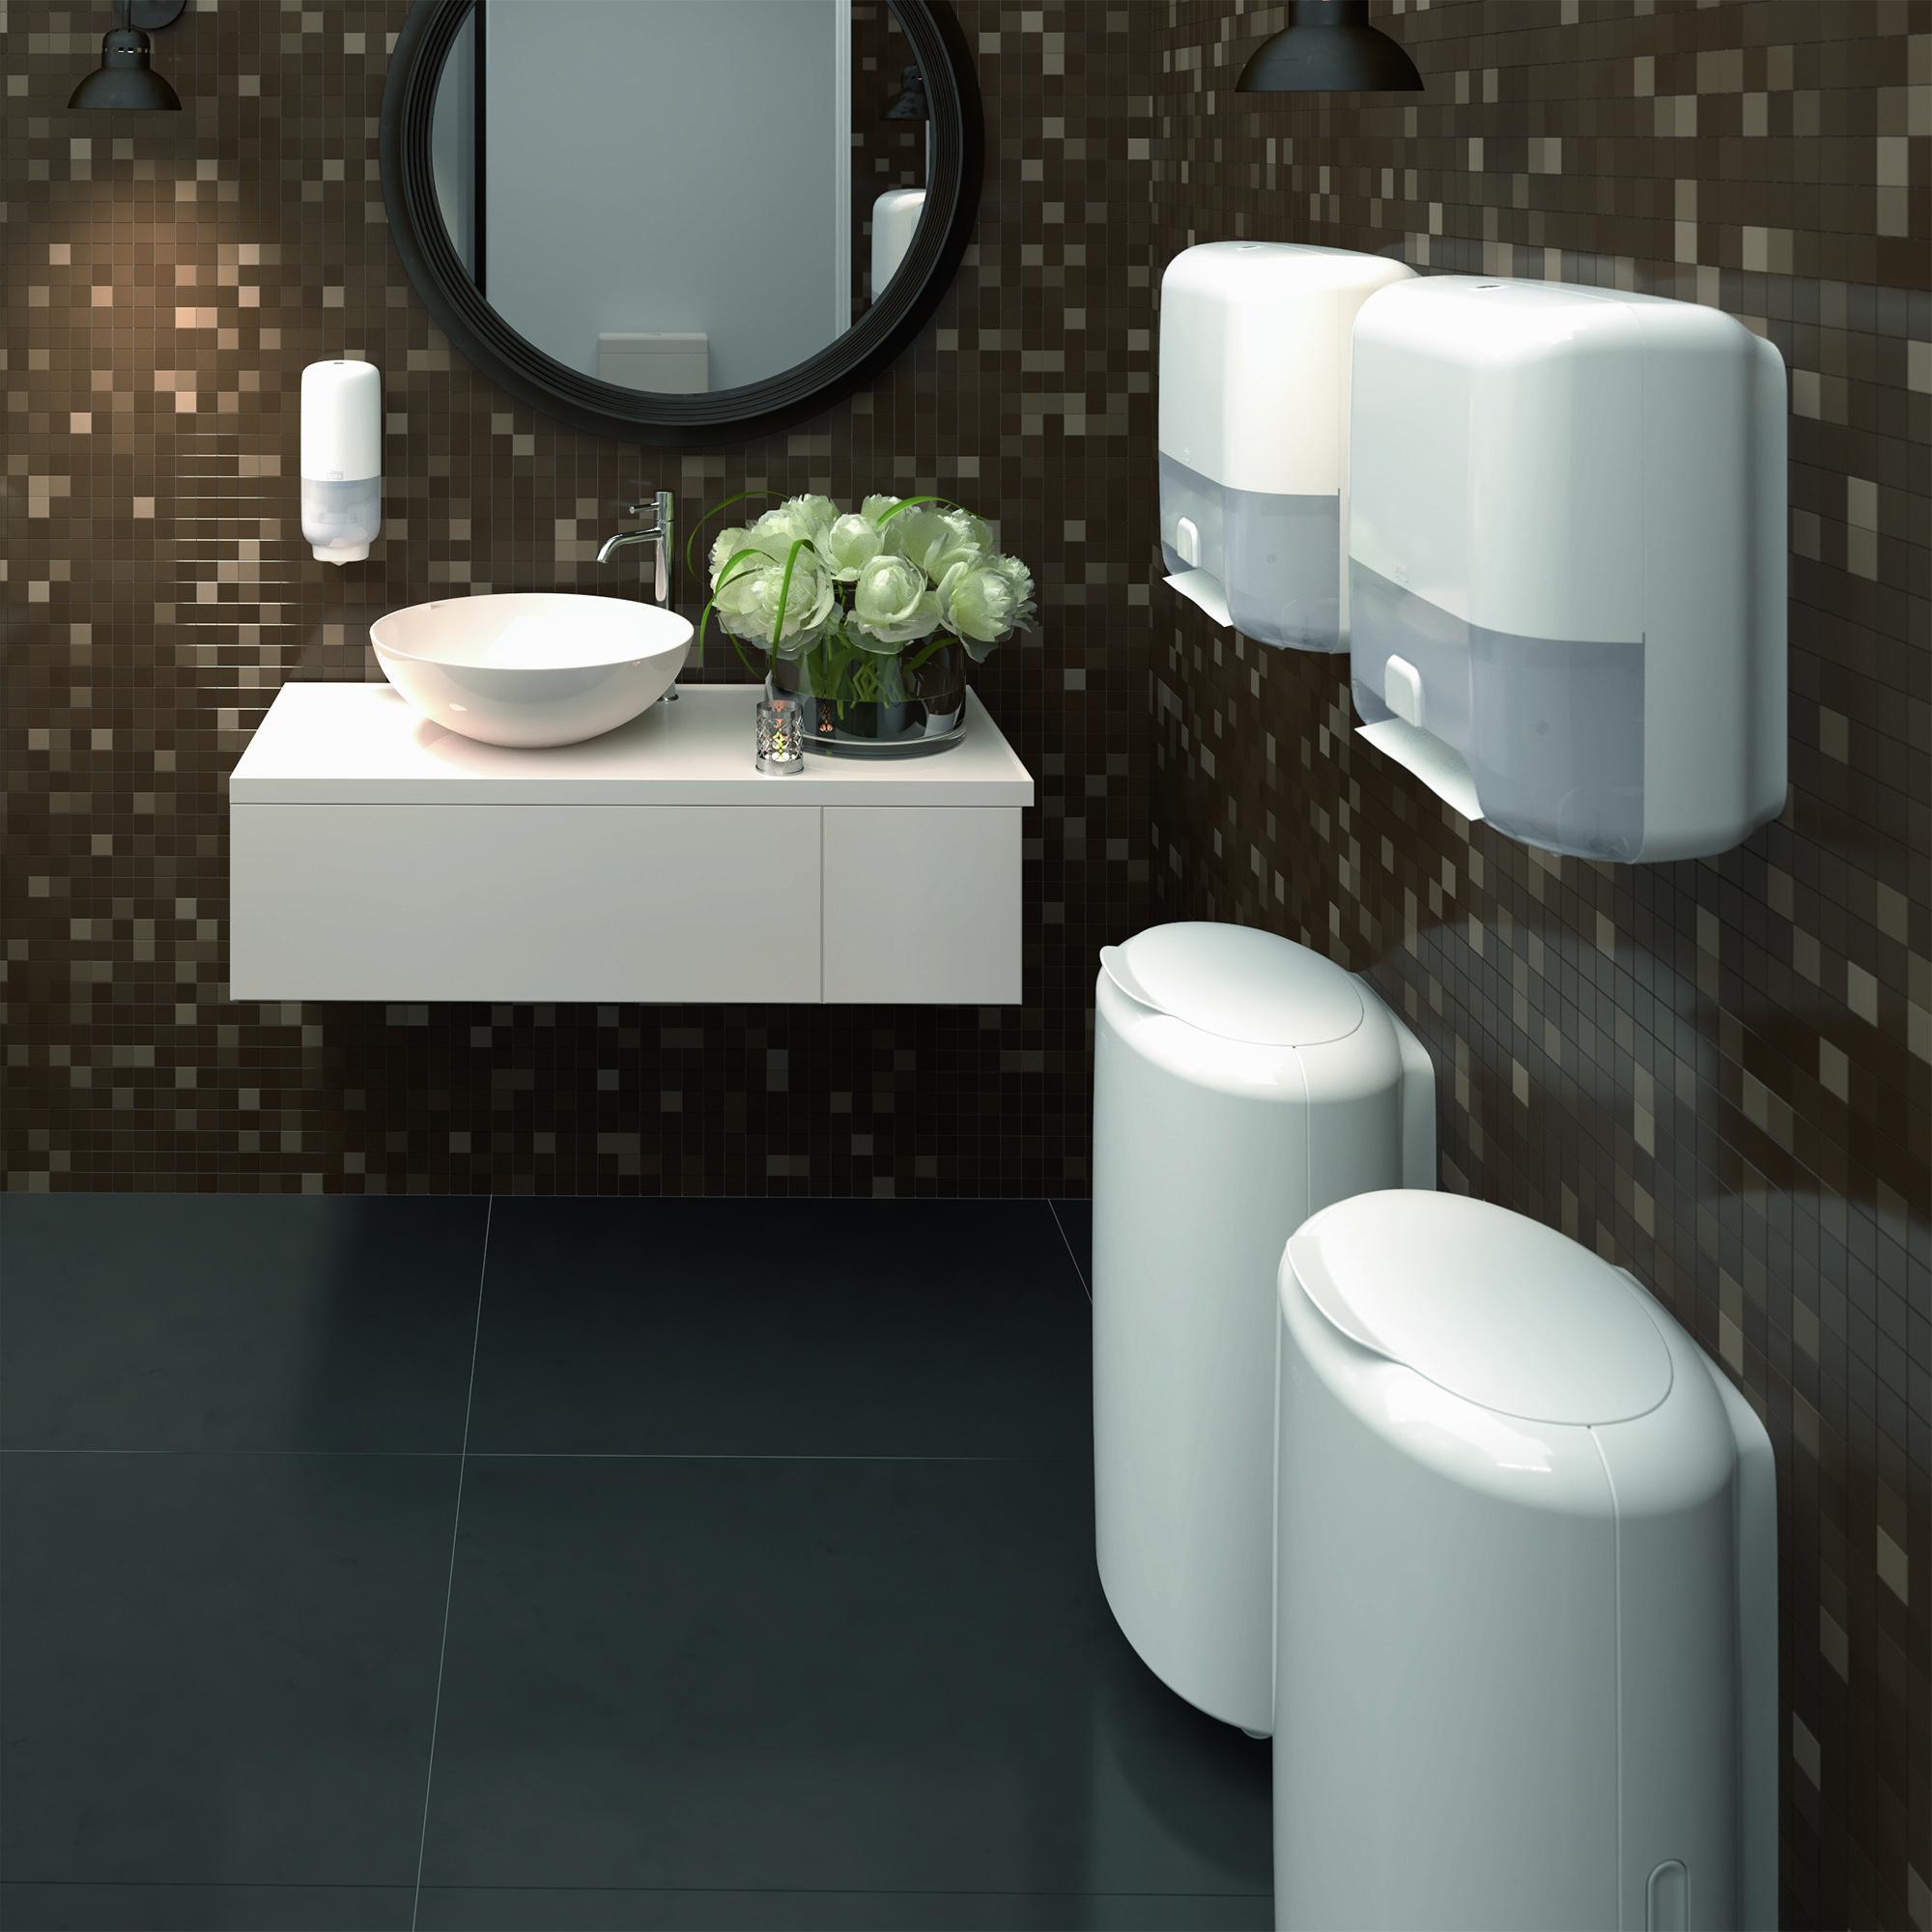 image-01-washroom-wow-factor-551100-5560